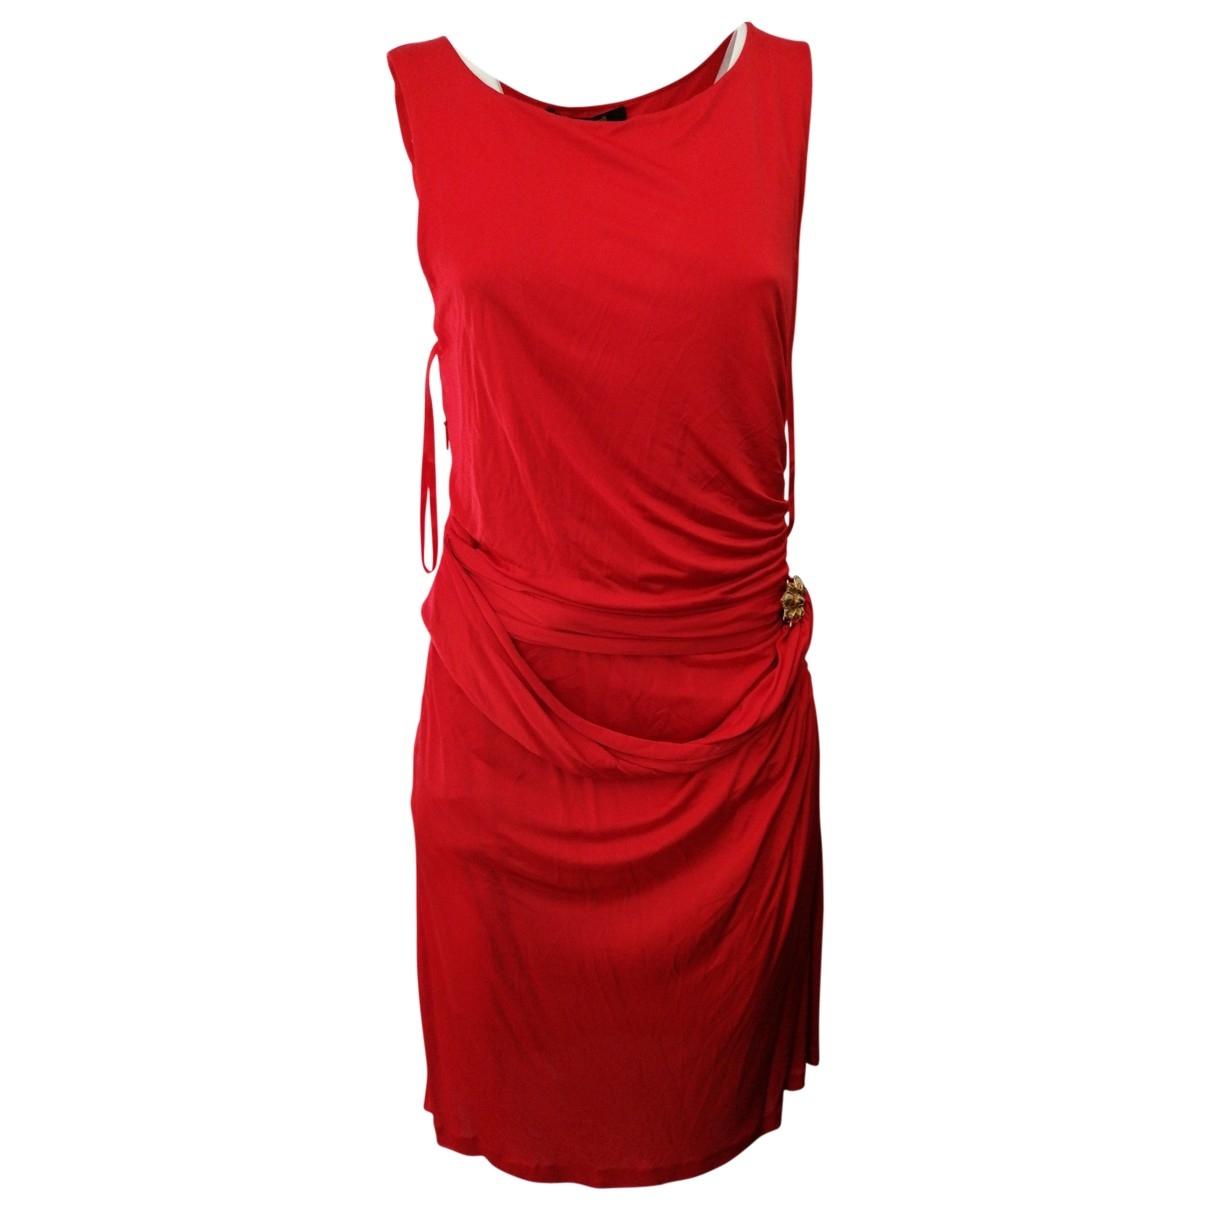 Roberto Cavalli \N Red dress for Women 44 IT